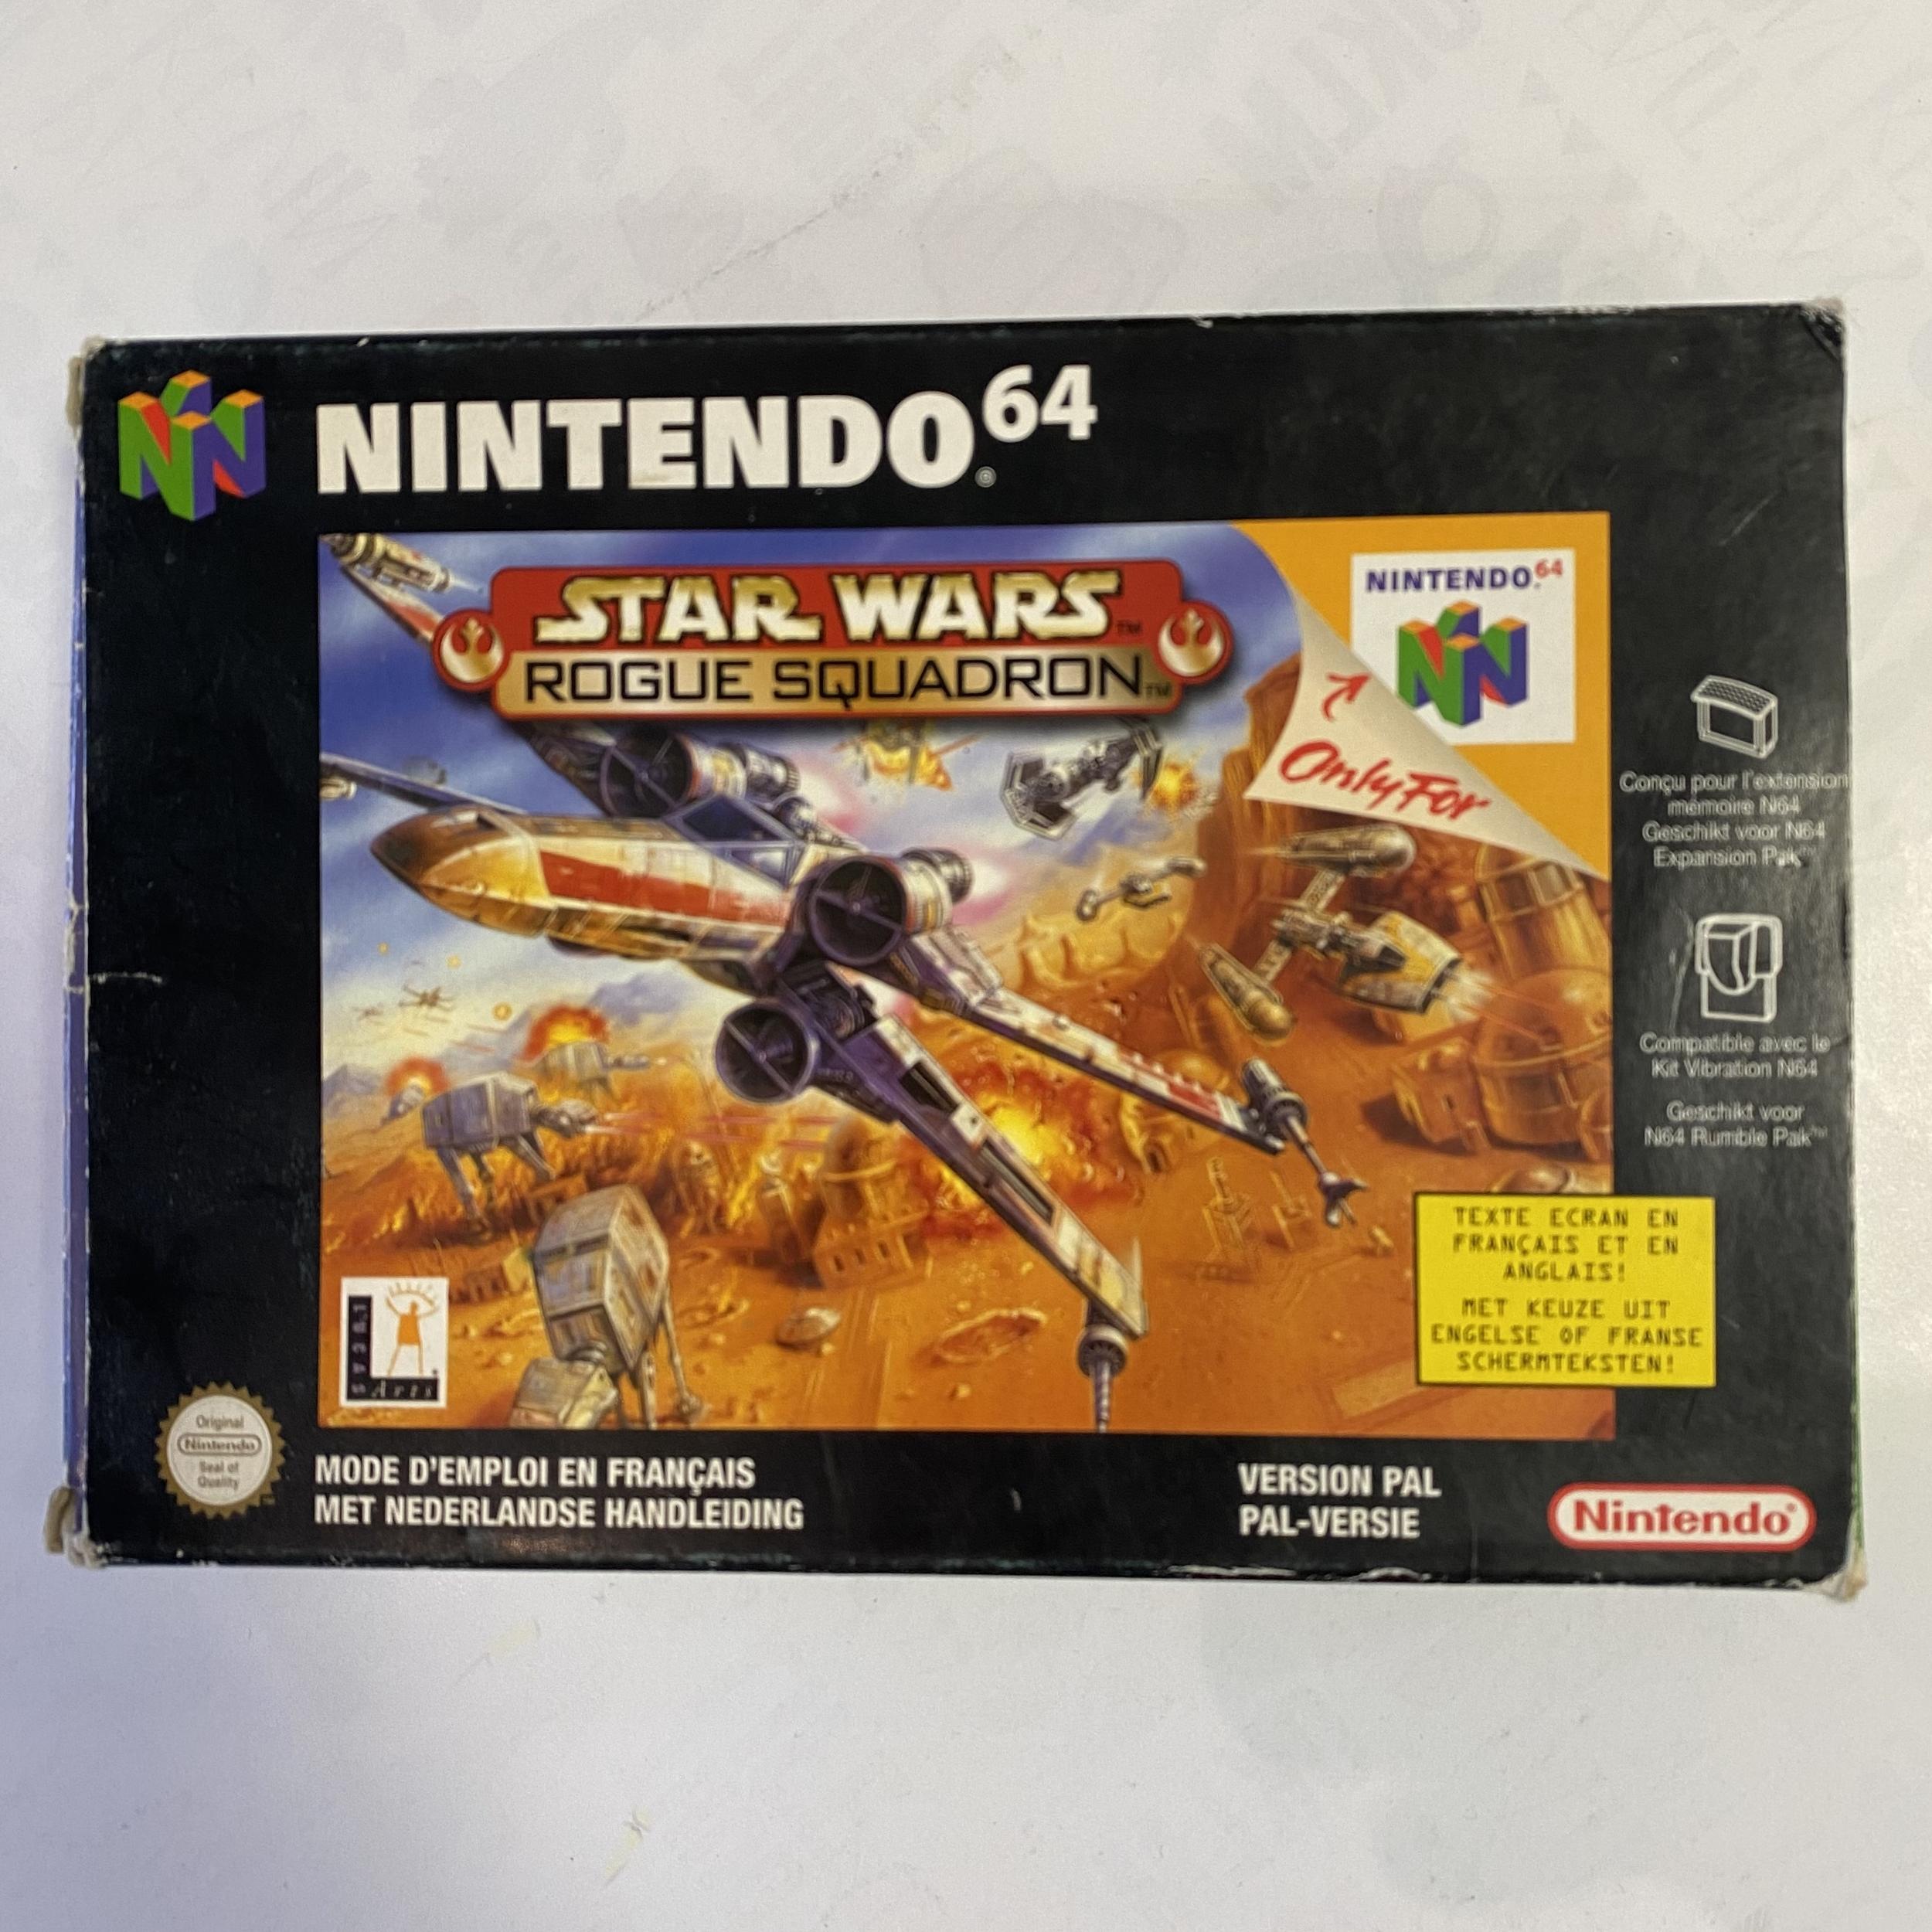 Nintendo 64 - Star Wars Rogue Squadron occasion